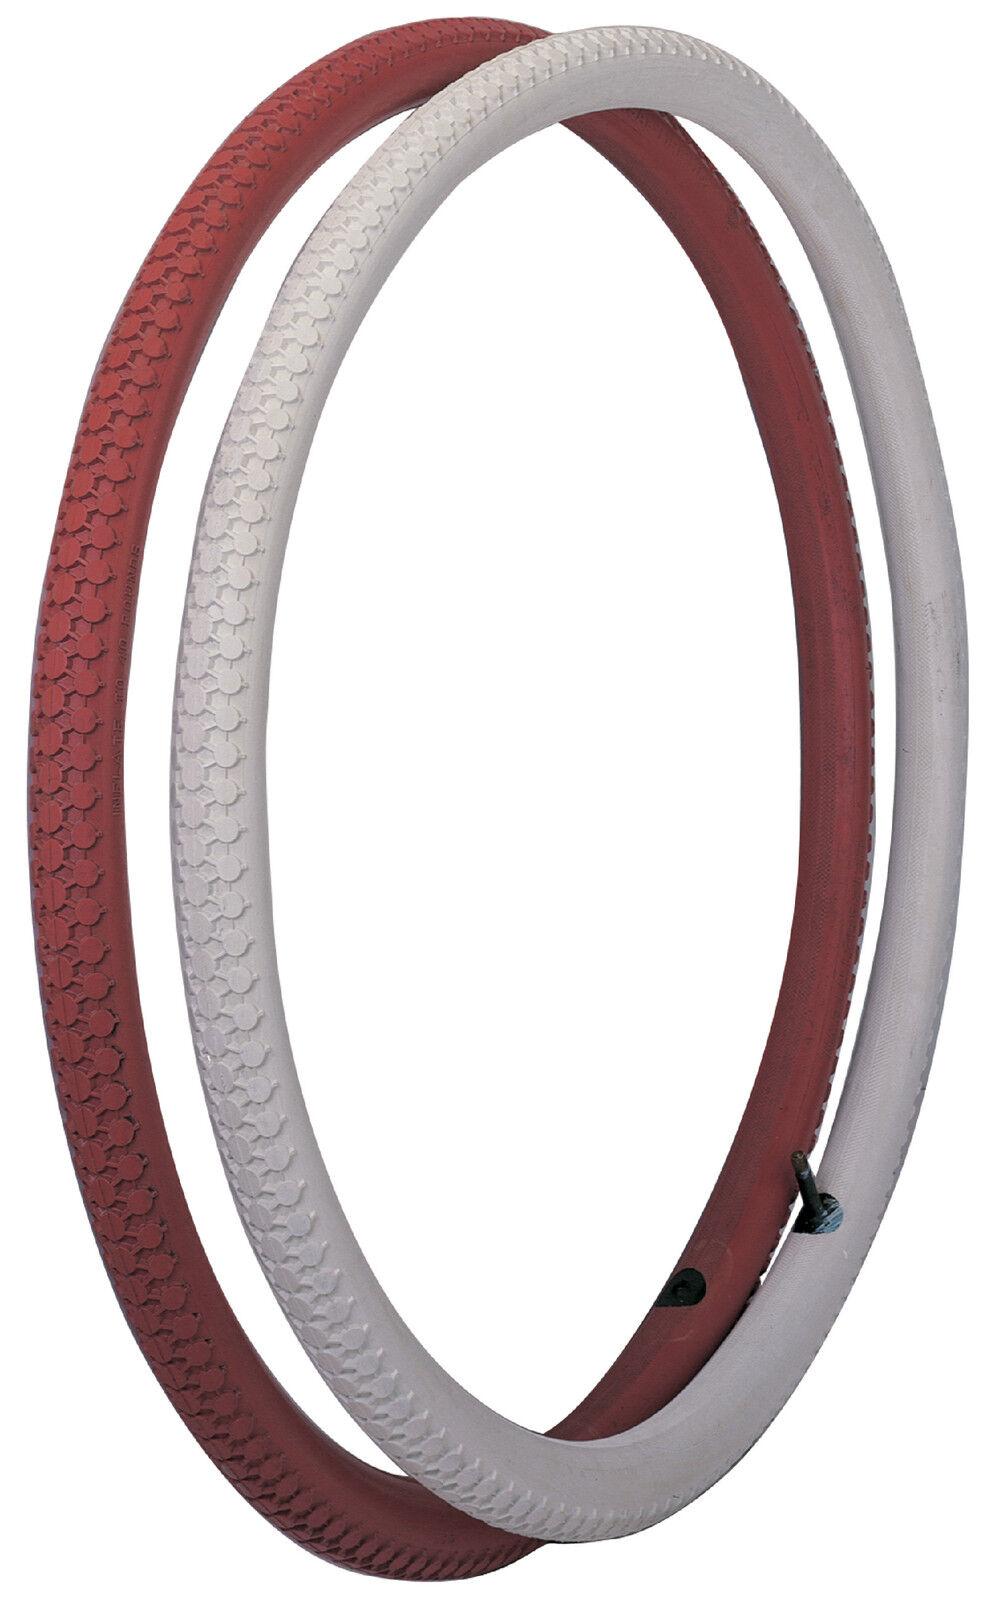 Universal Vintage Bicycle Tire 28x1-1 2 Cinnamon (red)